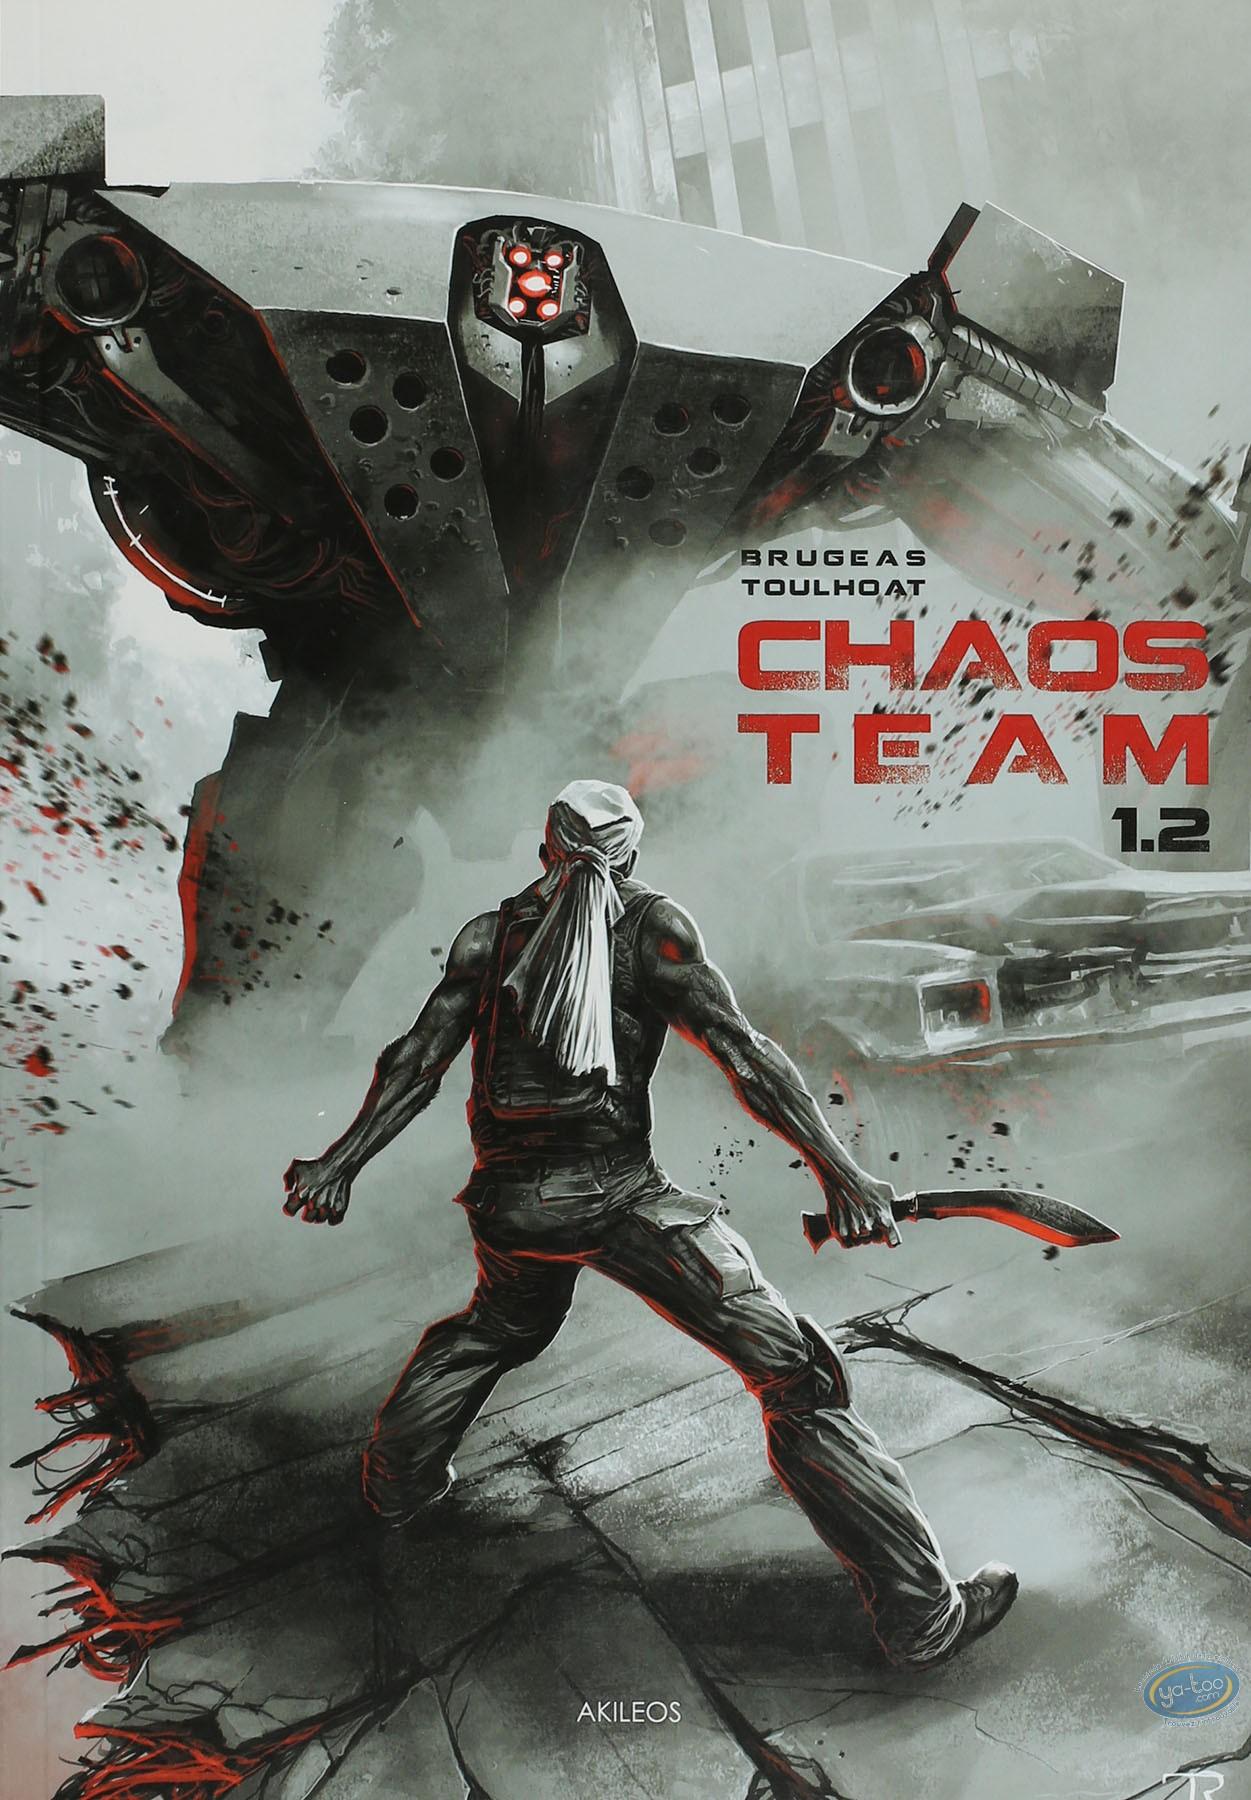 BD prix réduit, Chaos Team 1.2 : Chaos Team 1.2